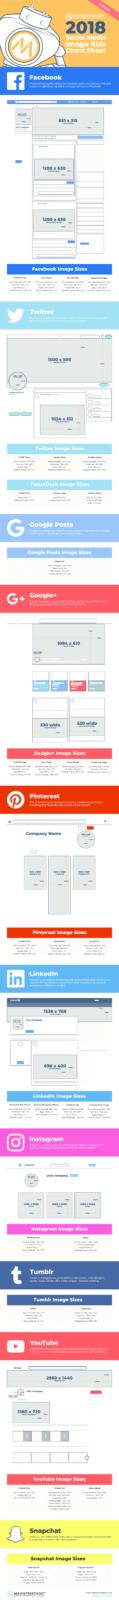 2018 Social Media Image Size Cheat Sheet